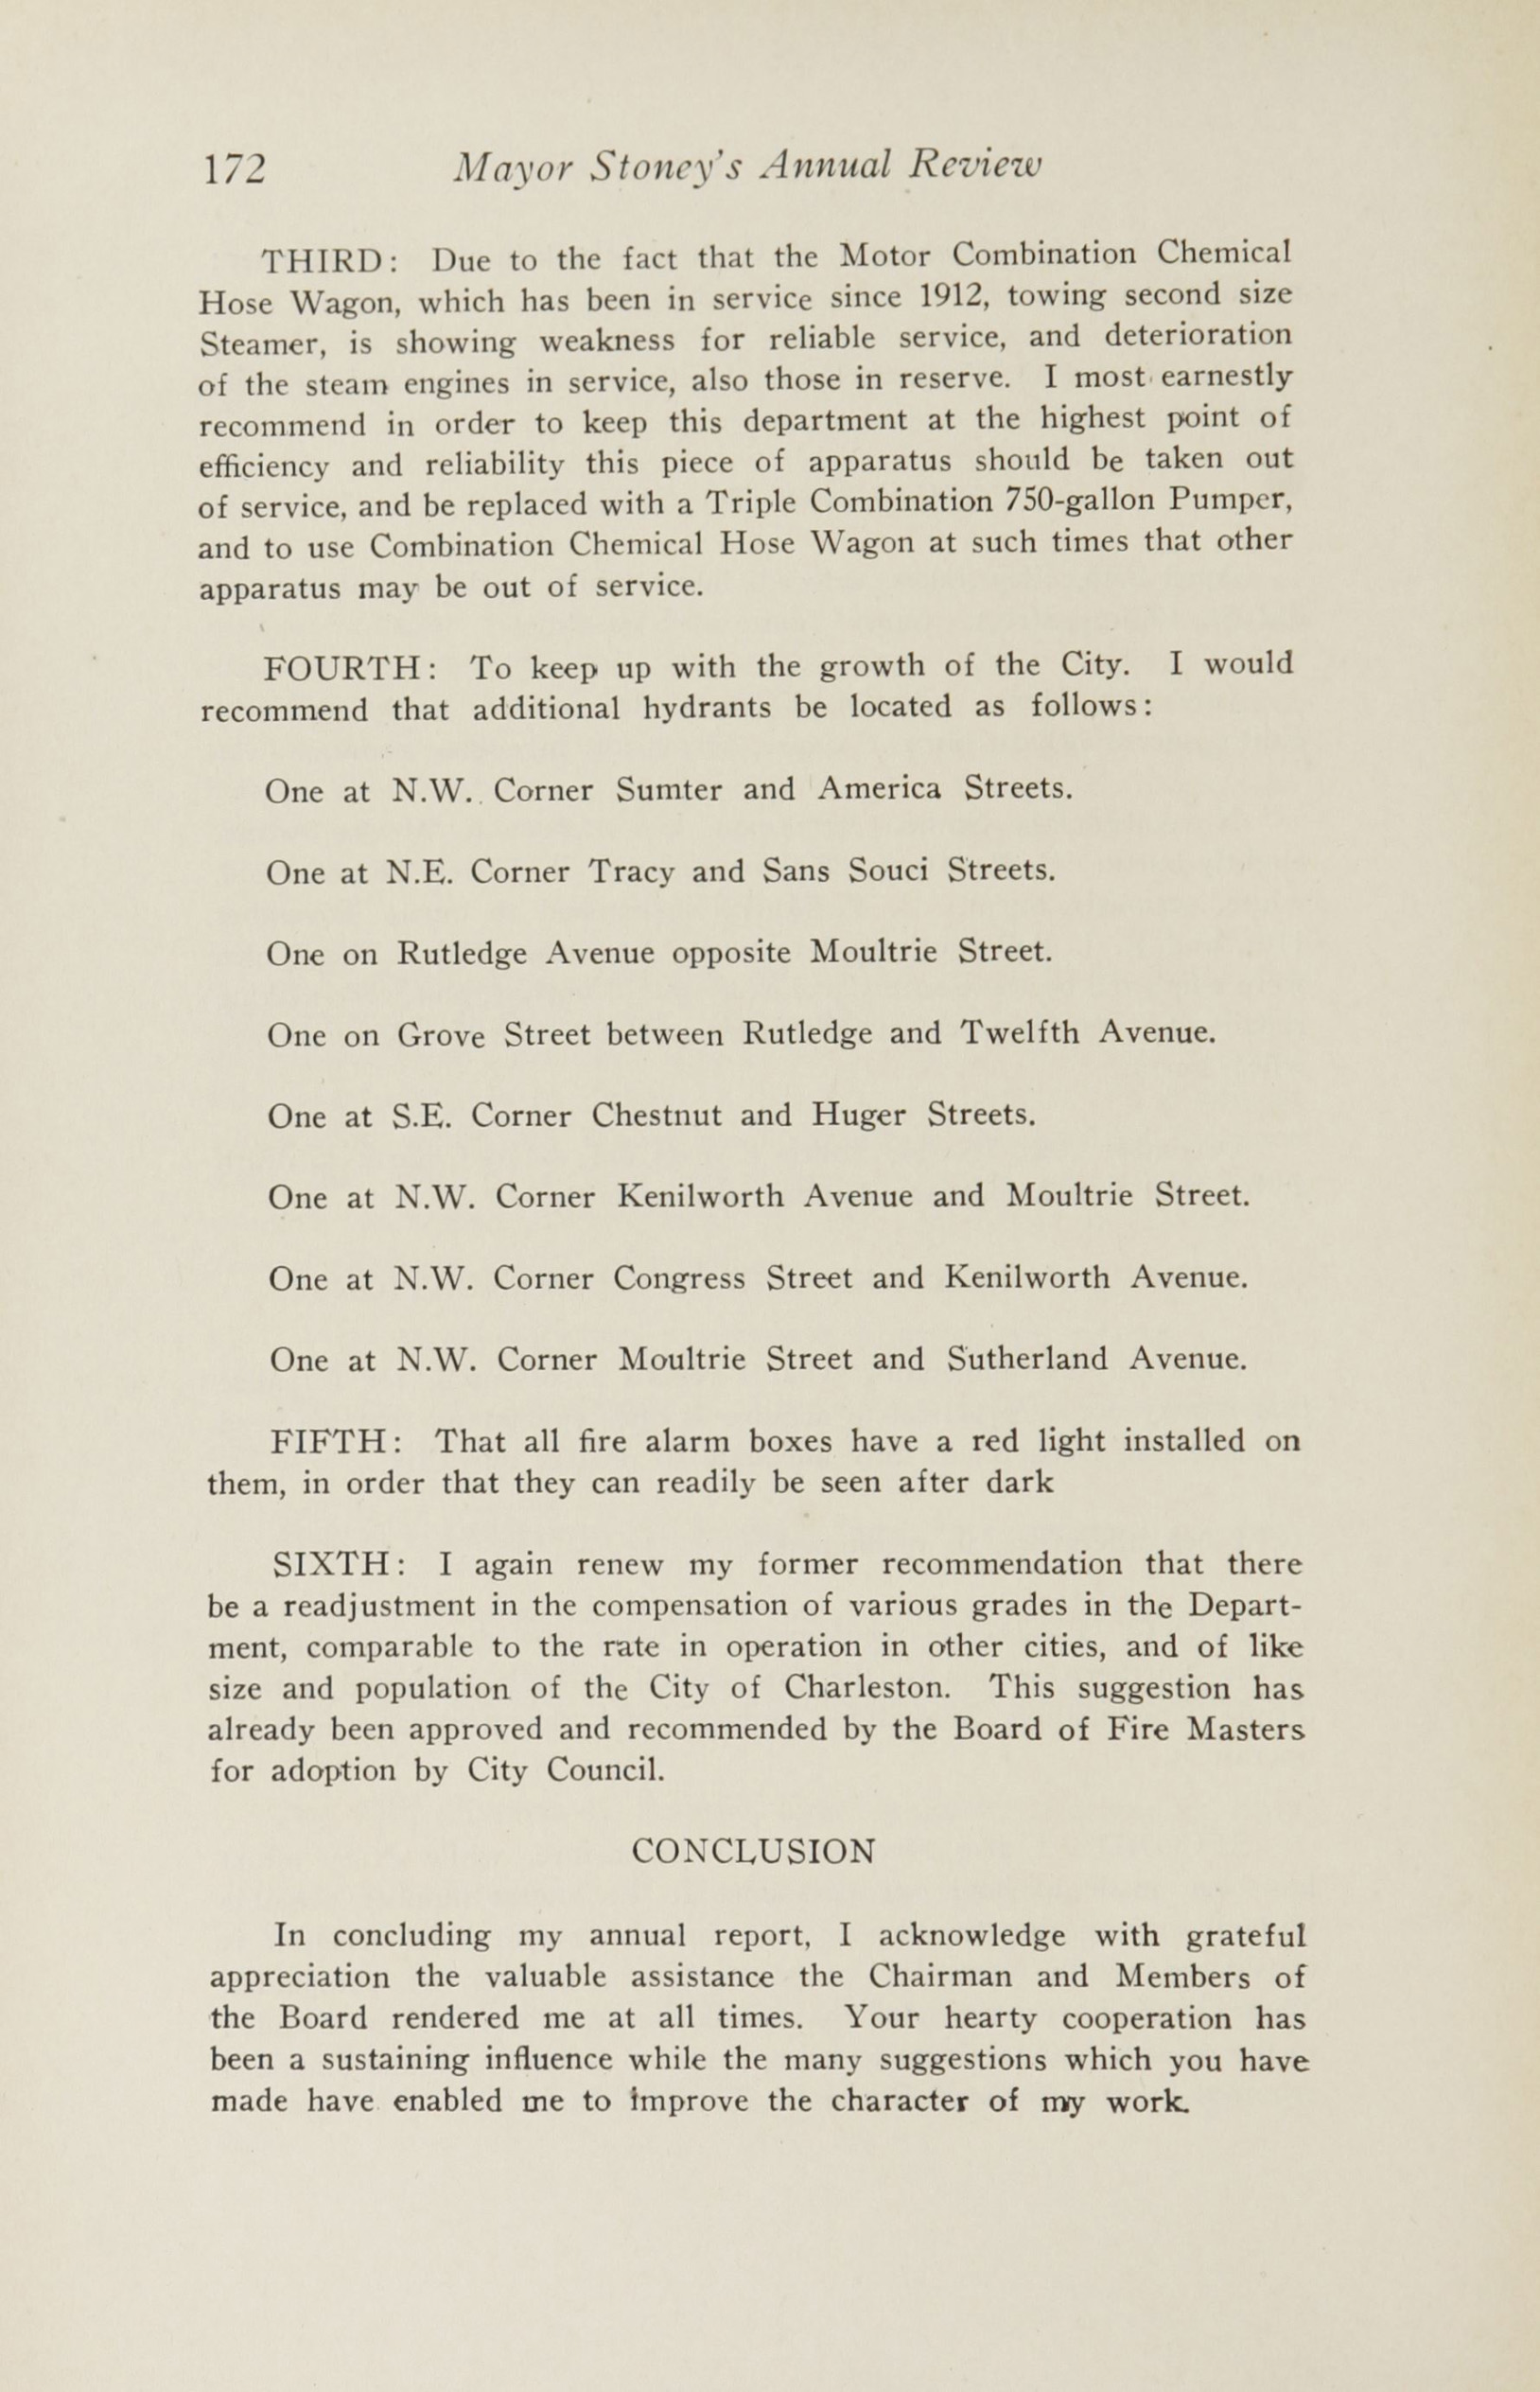 Charleston Yearbook, 1929, page 172